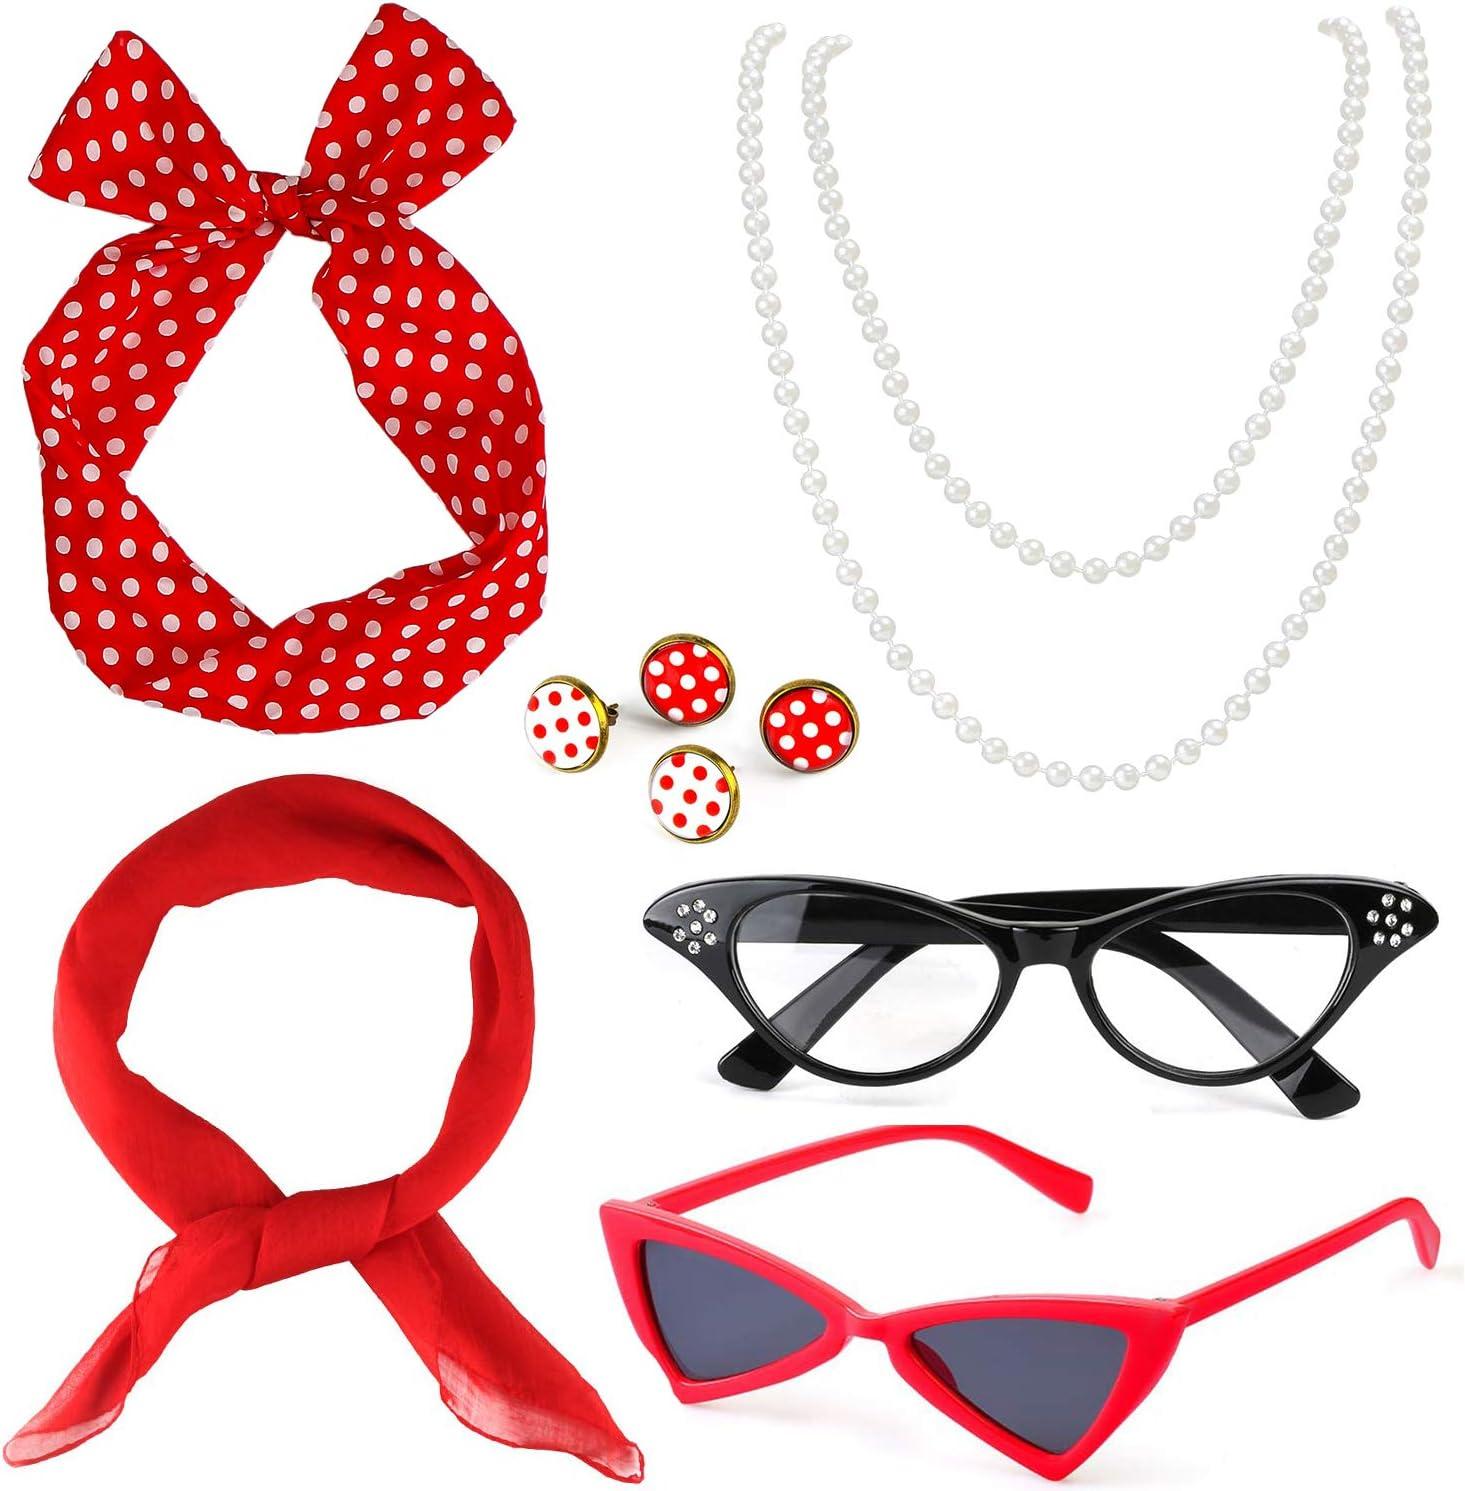 Beelittle 50's Women Costume Accessories Set Bufanda de Gasa Polka Dot Bandana Tie Diadema Pendientes Retro Cat Eye Eglasses Collar de Perla (Rojo)